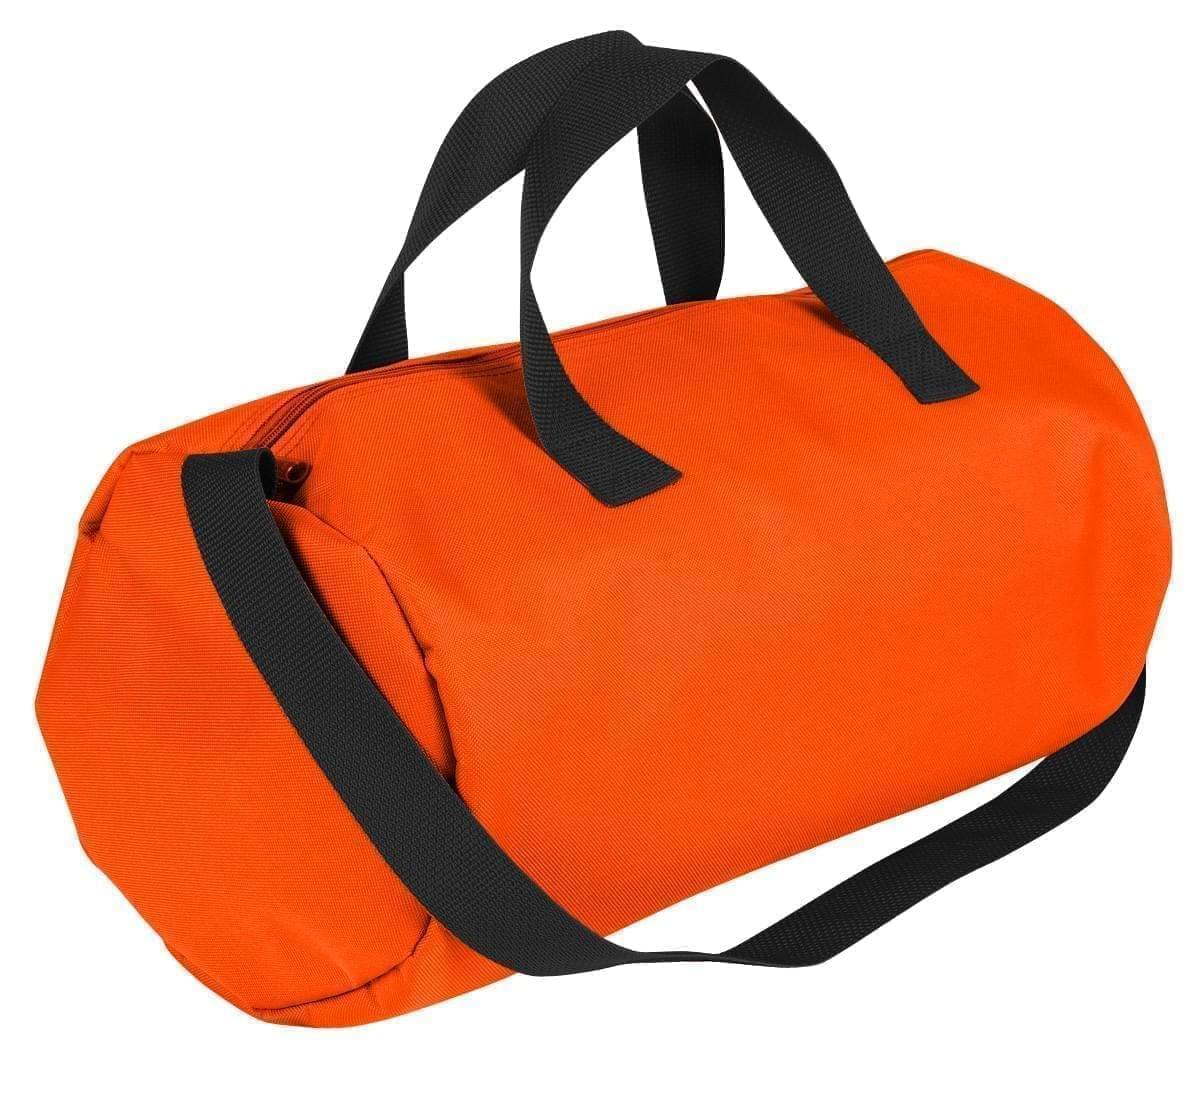 USA Made Nylon Poly Gym Roll Bags, Orange-Black, ROCX31AAXR